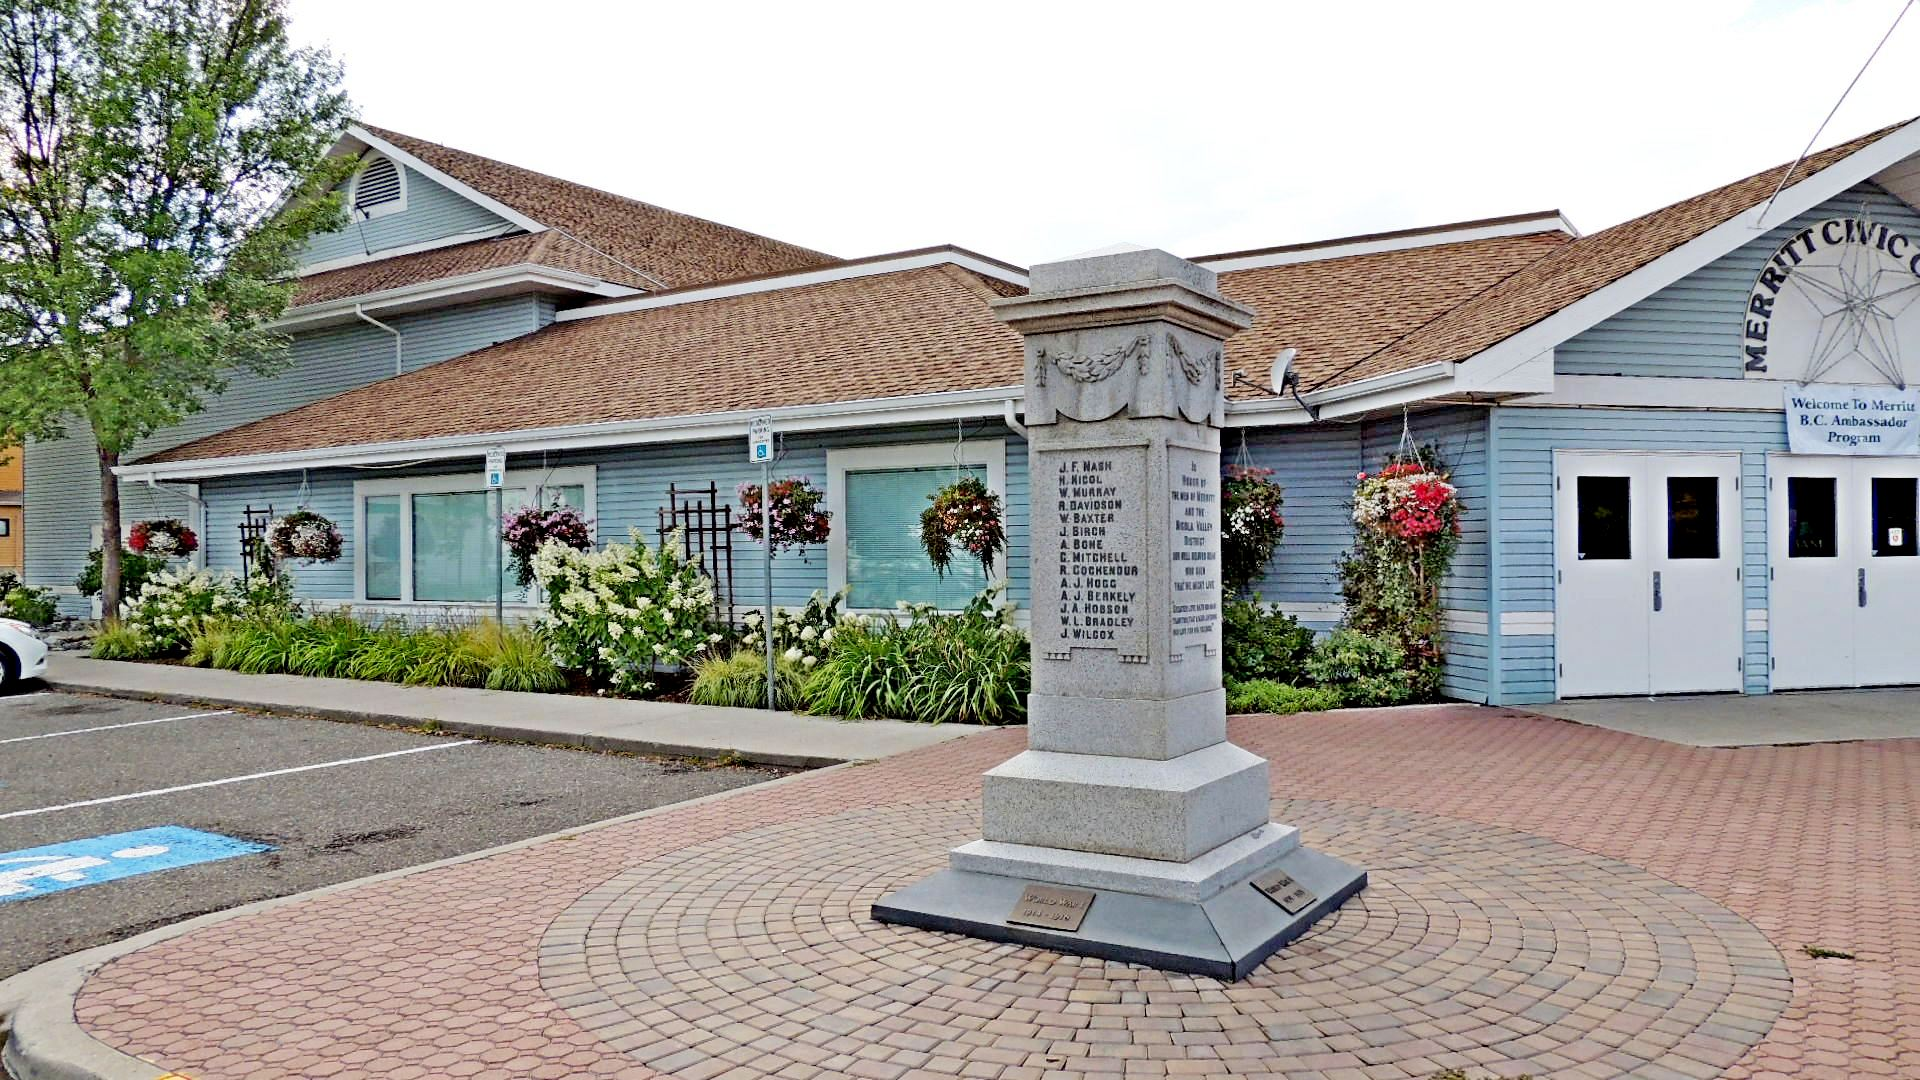 Merritt (BC) Canada  City pictures : Merritt Cenotaph Merritt, BC Canadian Legion Memorials Cairns and ...